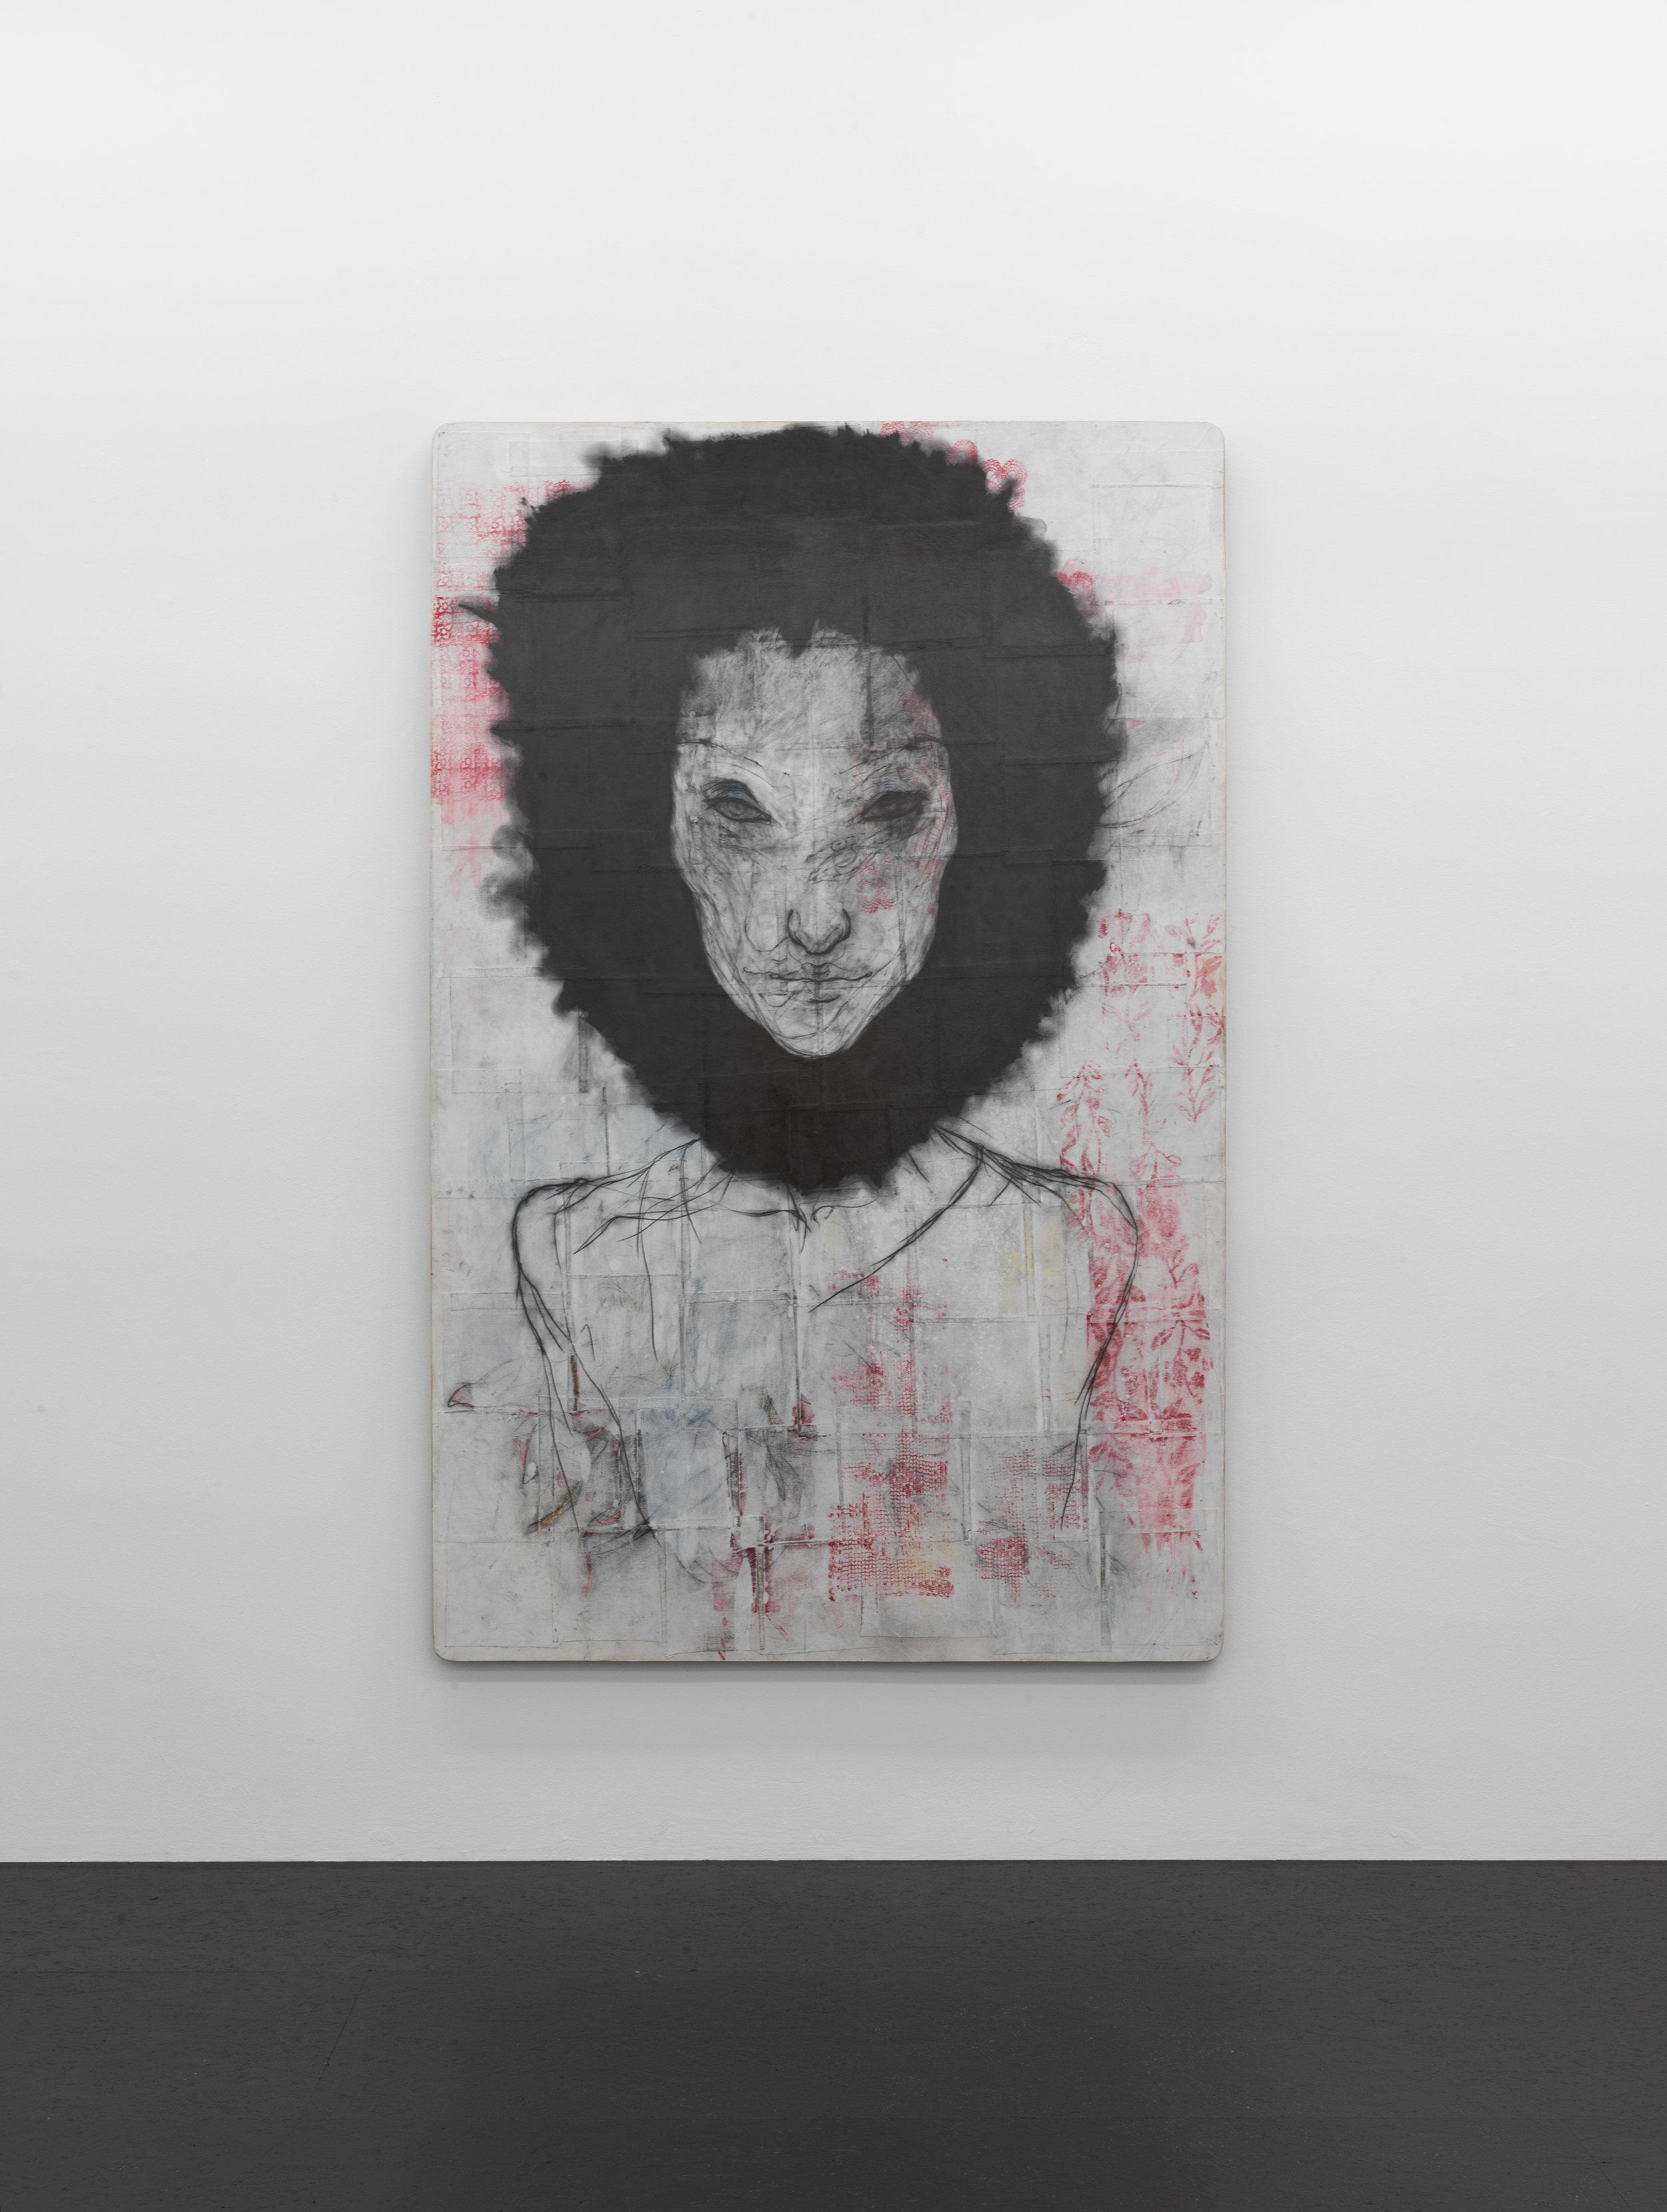 Peter Senoner, Circus Corpus #23, 2019 graphite, oil on purple beechwood, 50x40x3cm